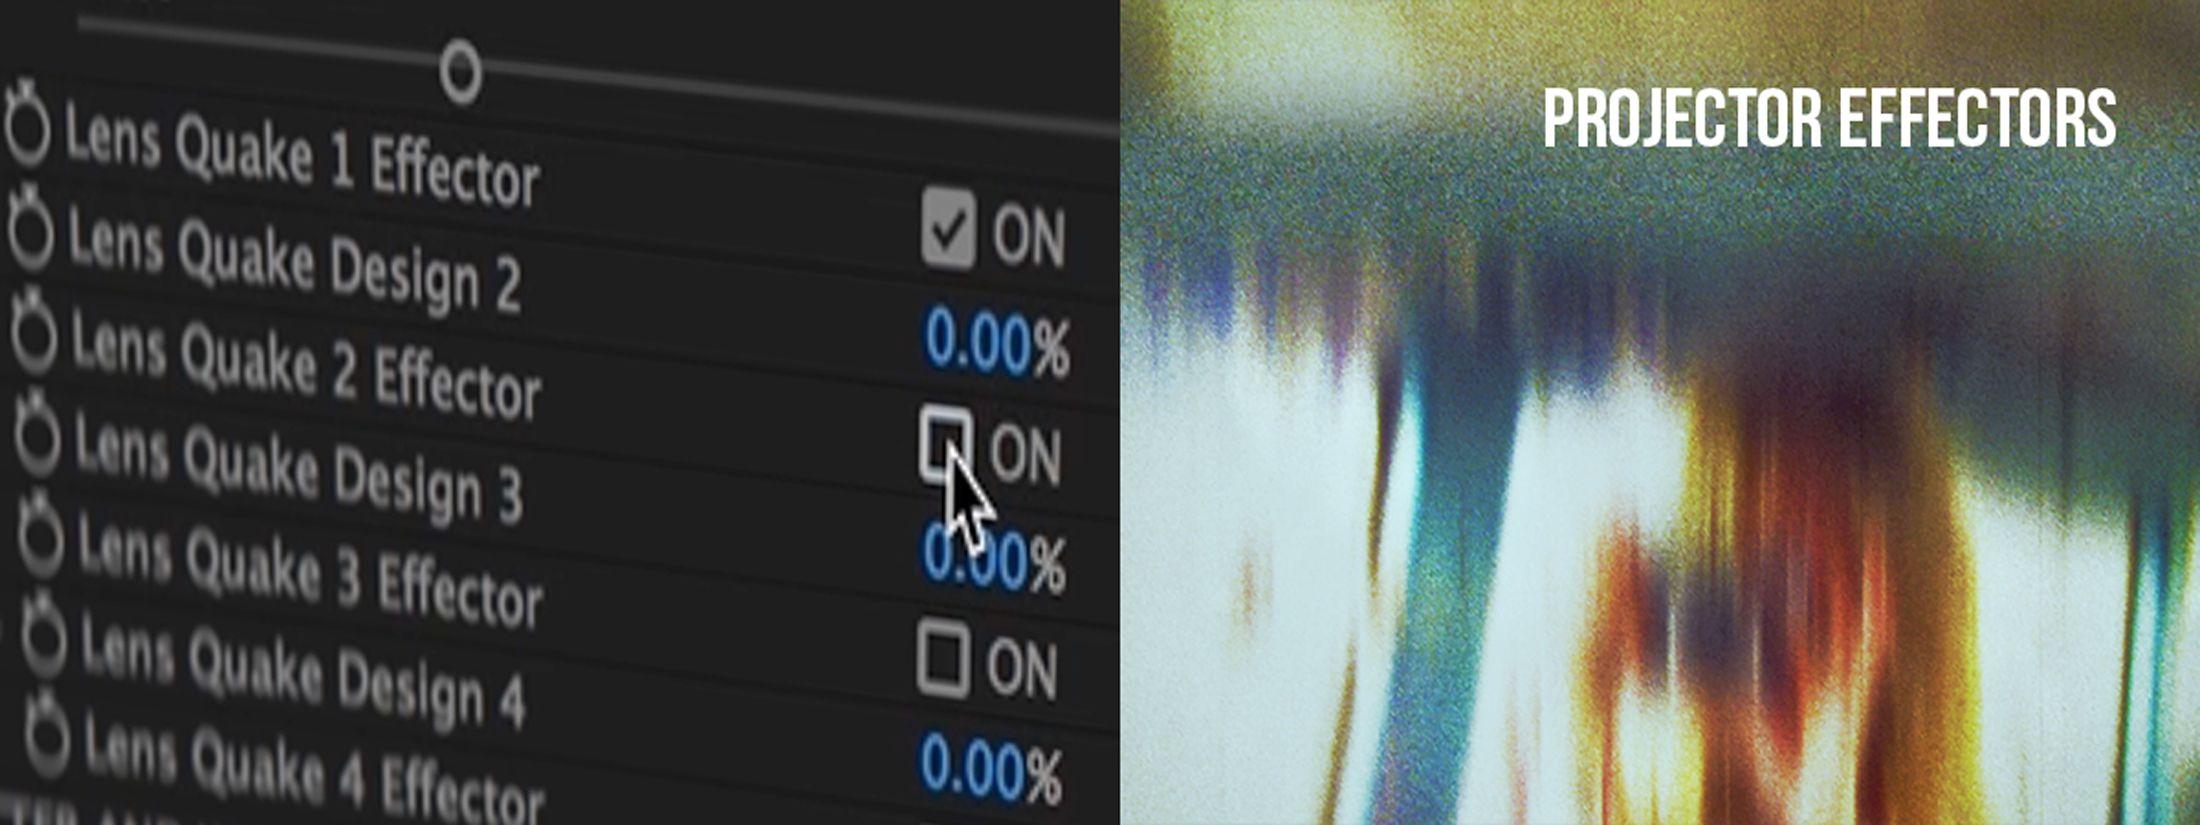 filmmaker vfx suite FILMMAKER VFX Suite film9